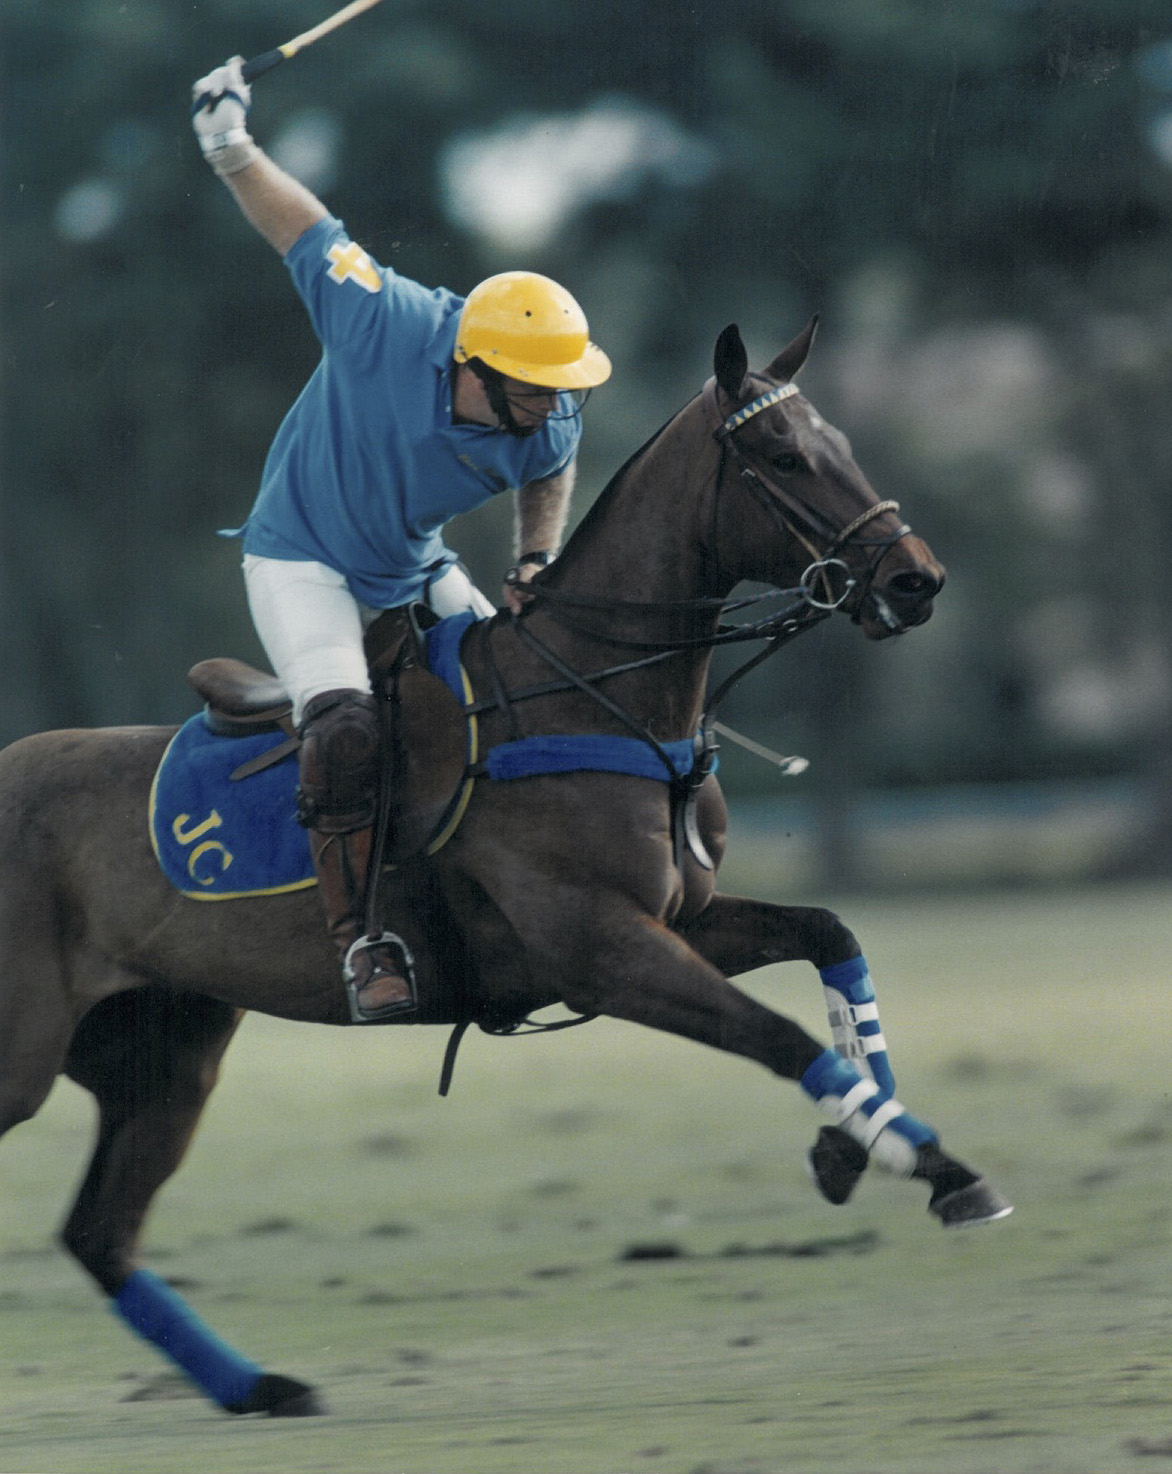 Joey riding Fendi